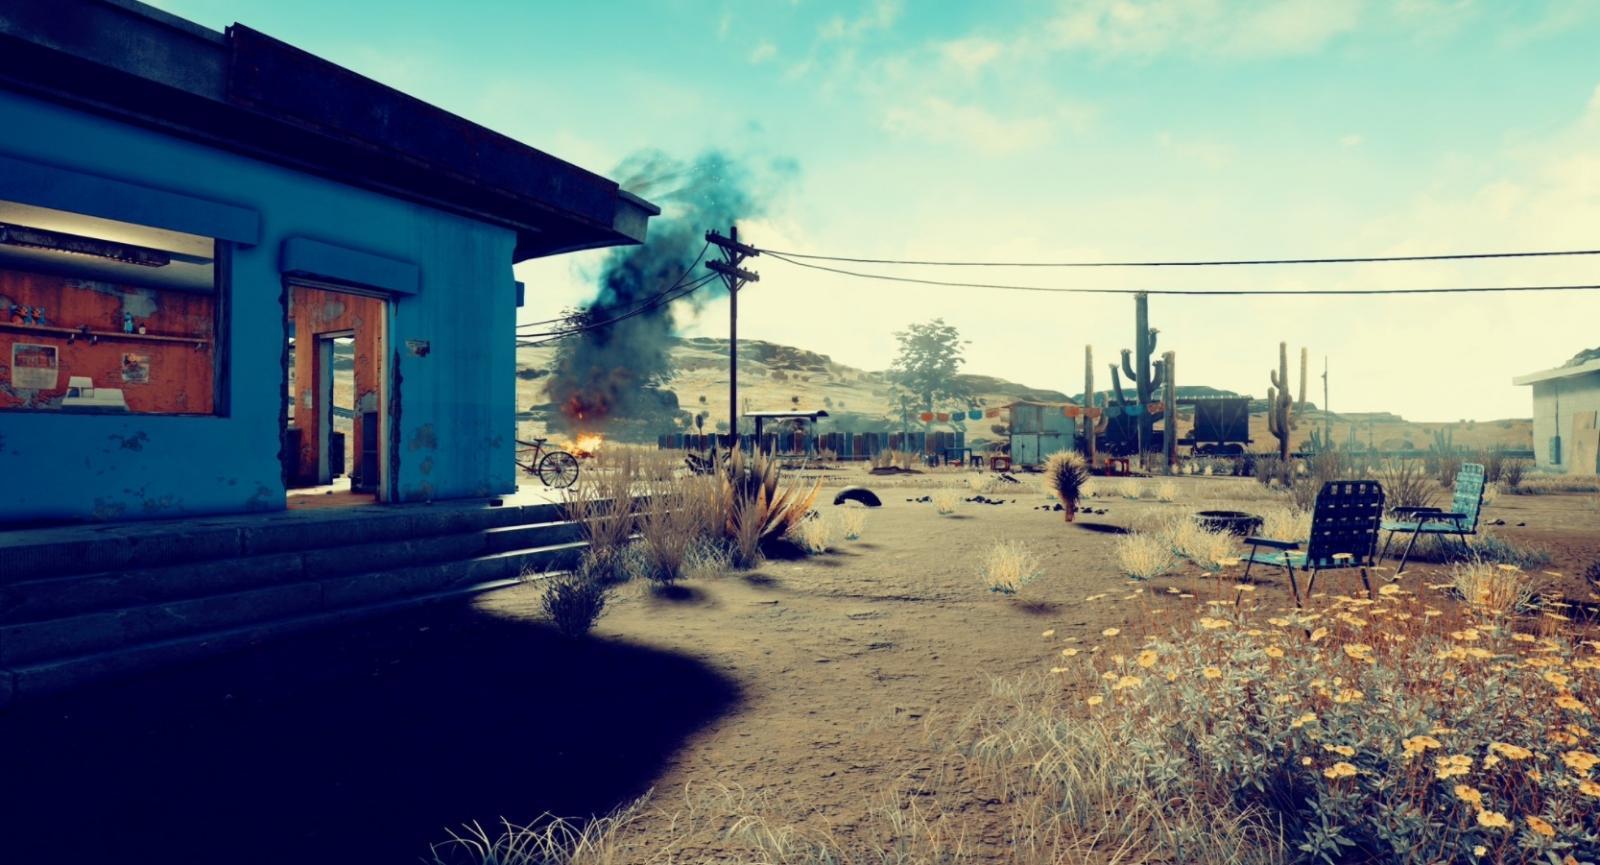 Playerunknown S Battlegrounds Wallpapers: 《絕地求生》新地圖「砂漠」畫面曝光,還原美國西部場景